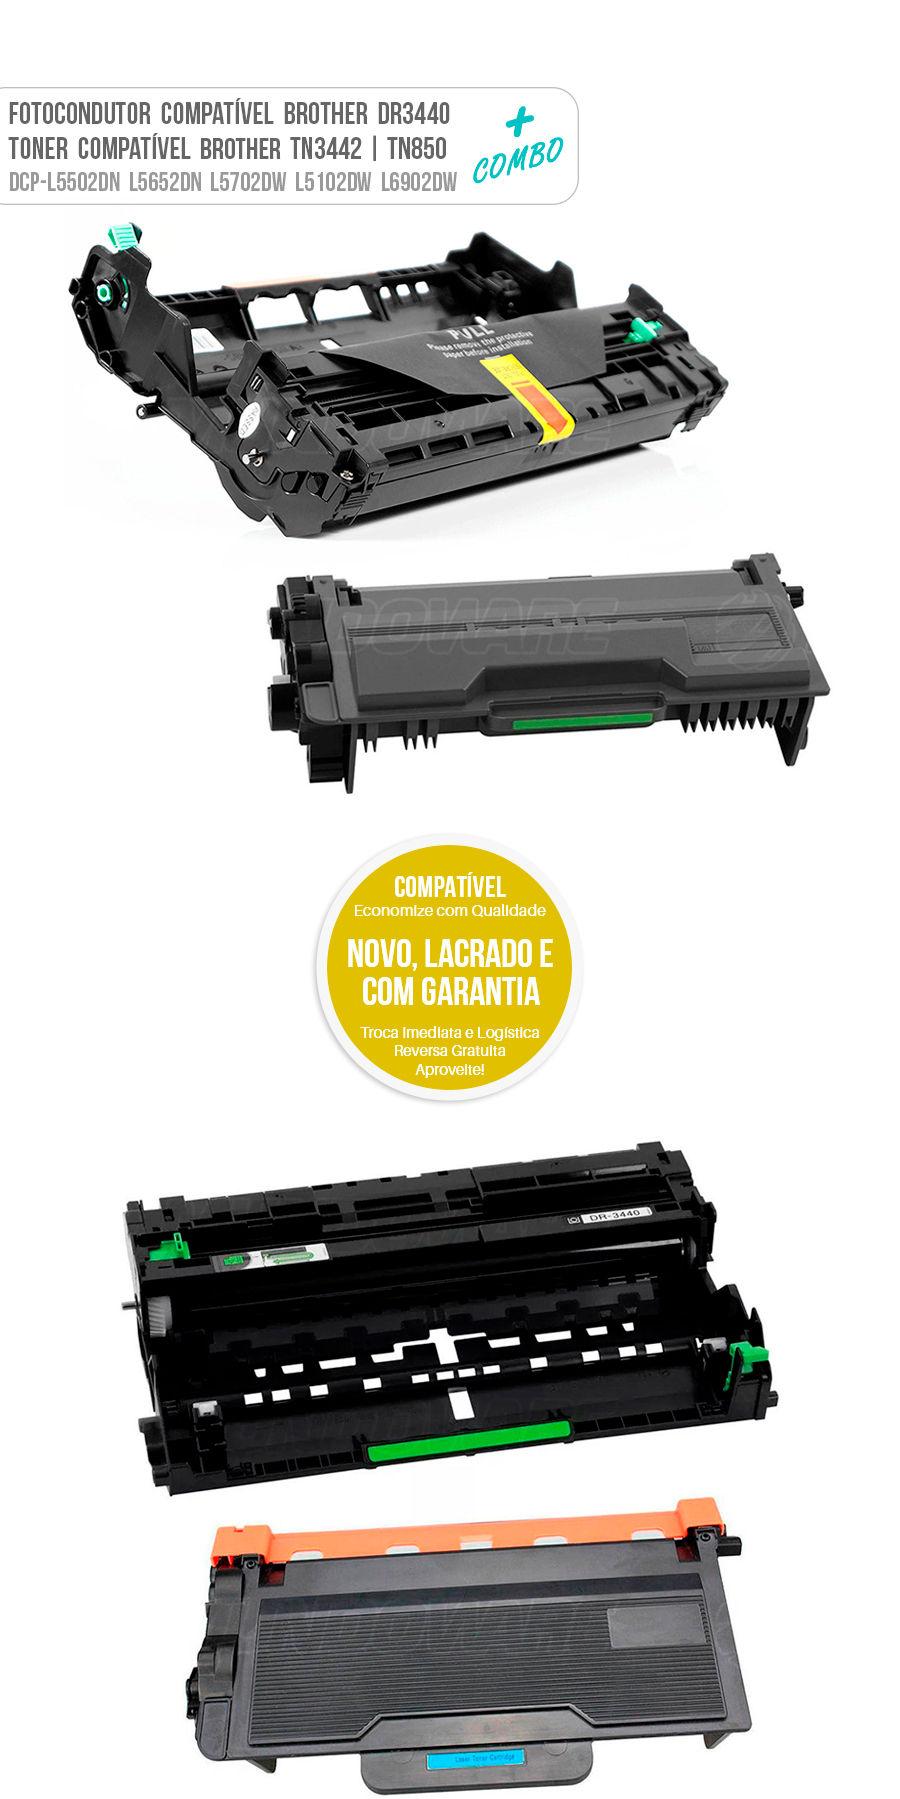 Drum Fotocondutor Tambor de Imagem Unidade Cilindro Kit DR DR3440 3440 TN850 3442 TN3442